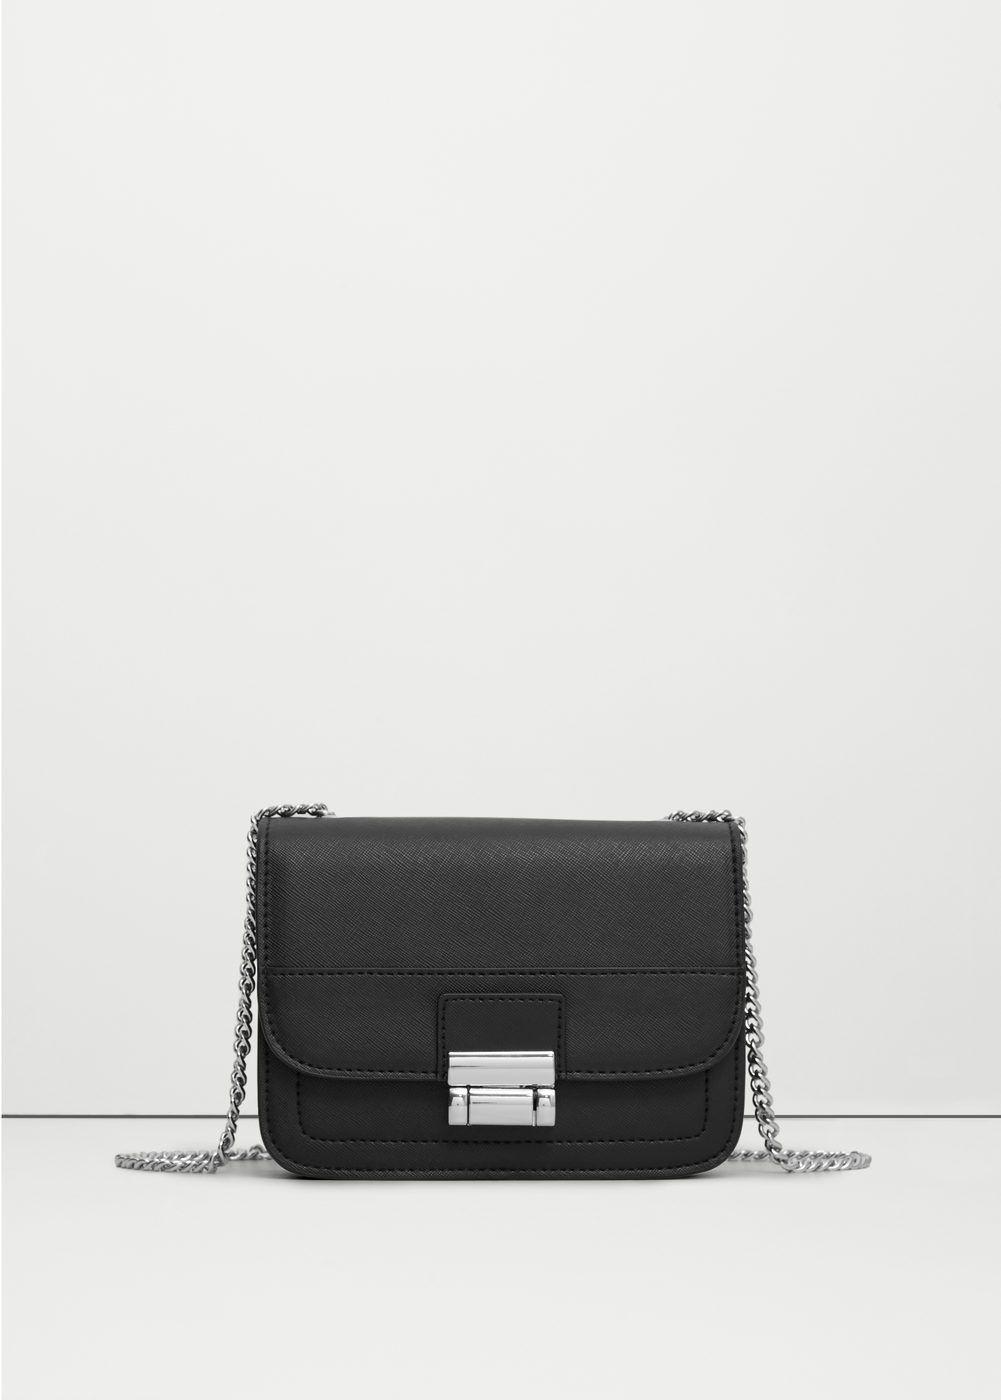 2019 Tommy hilfiger bayan çanta modelleri